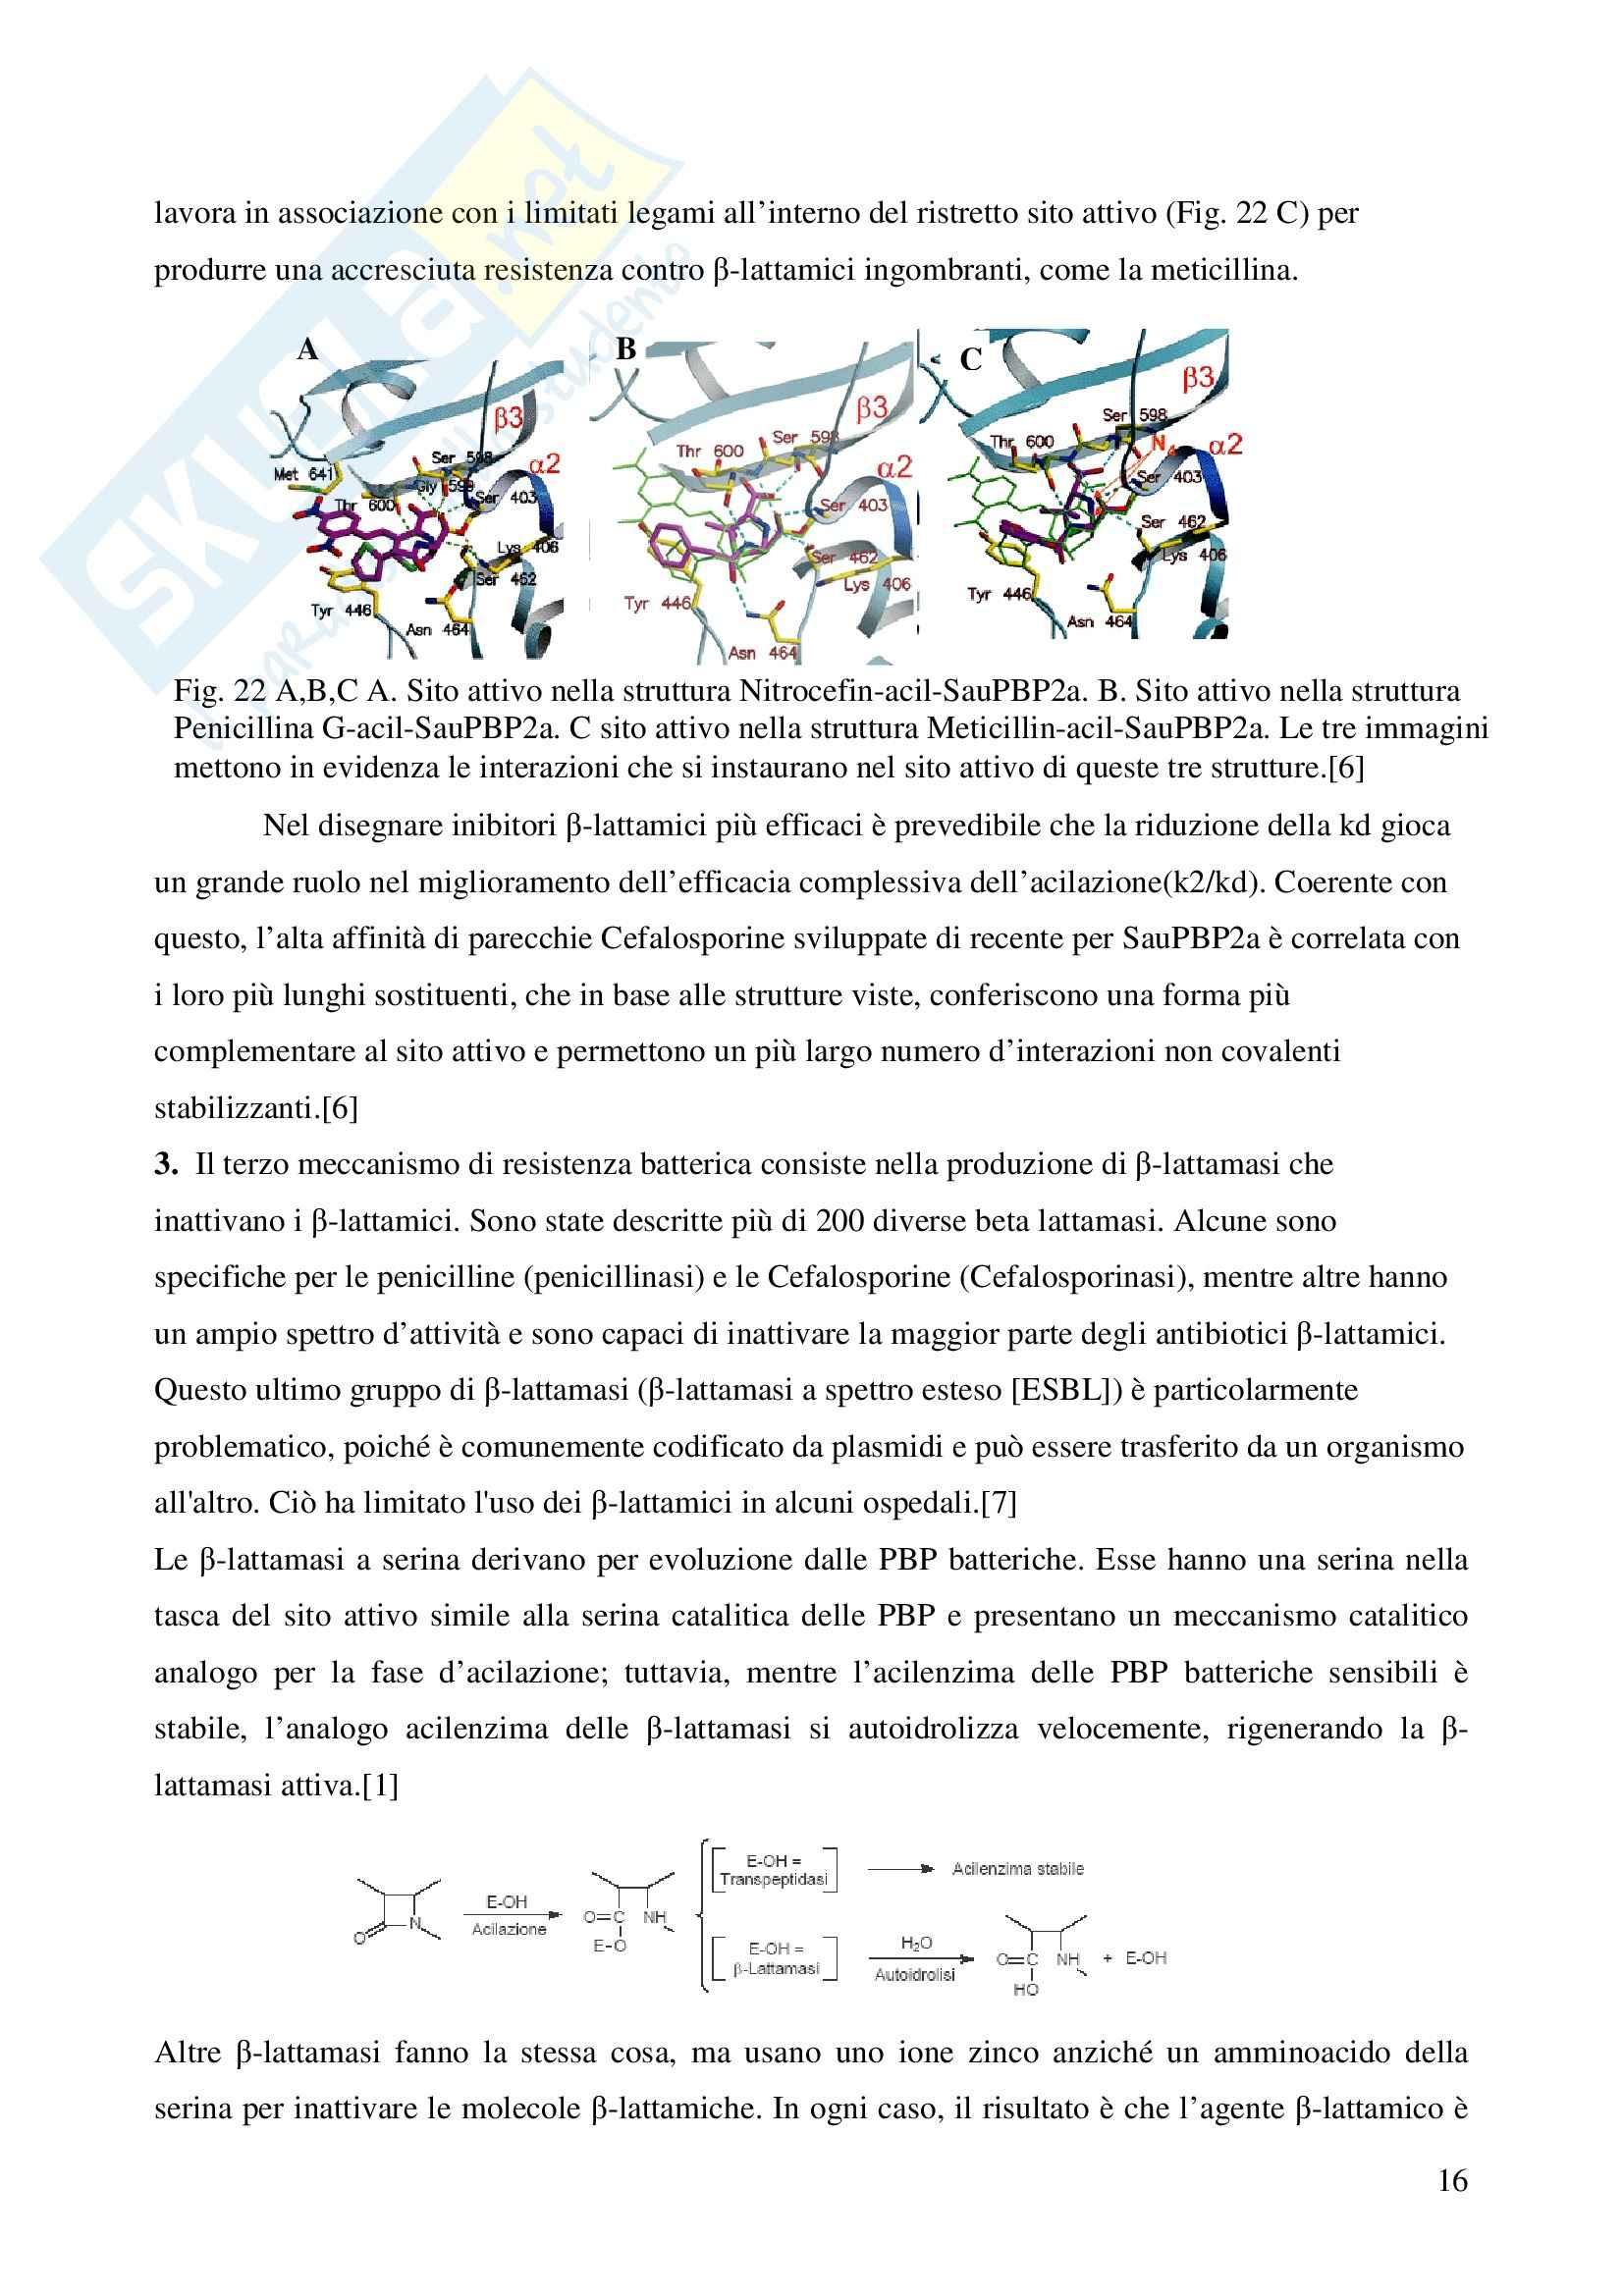 Chimica farmaceutica - le cefalosporine Pag. 16